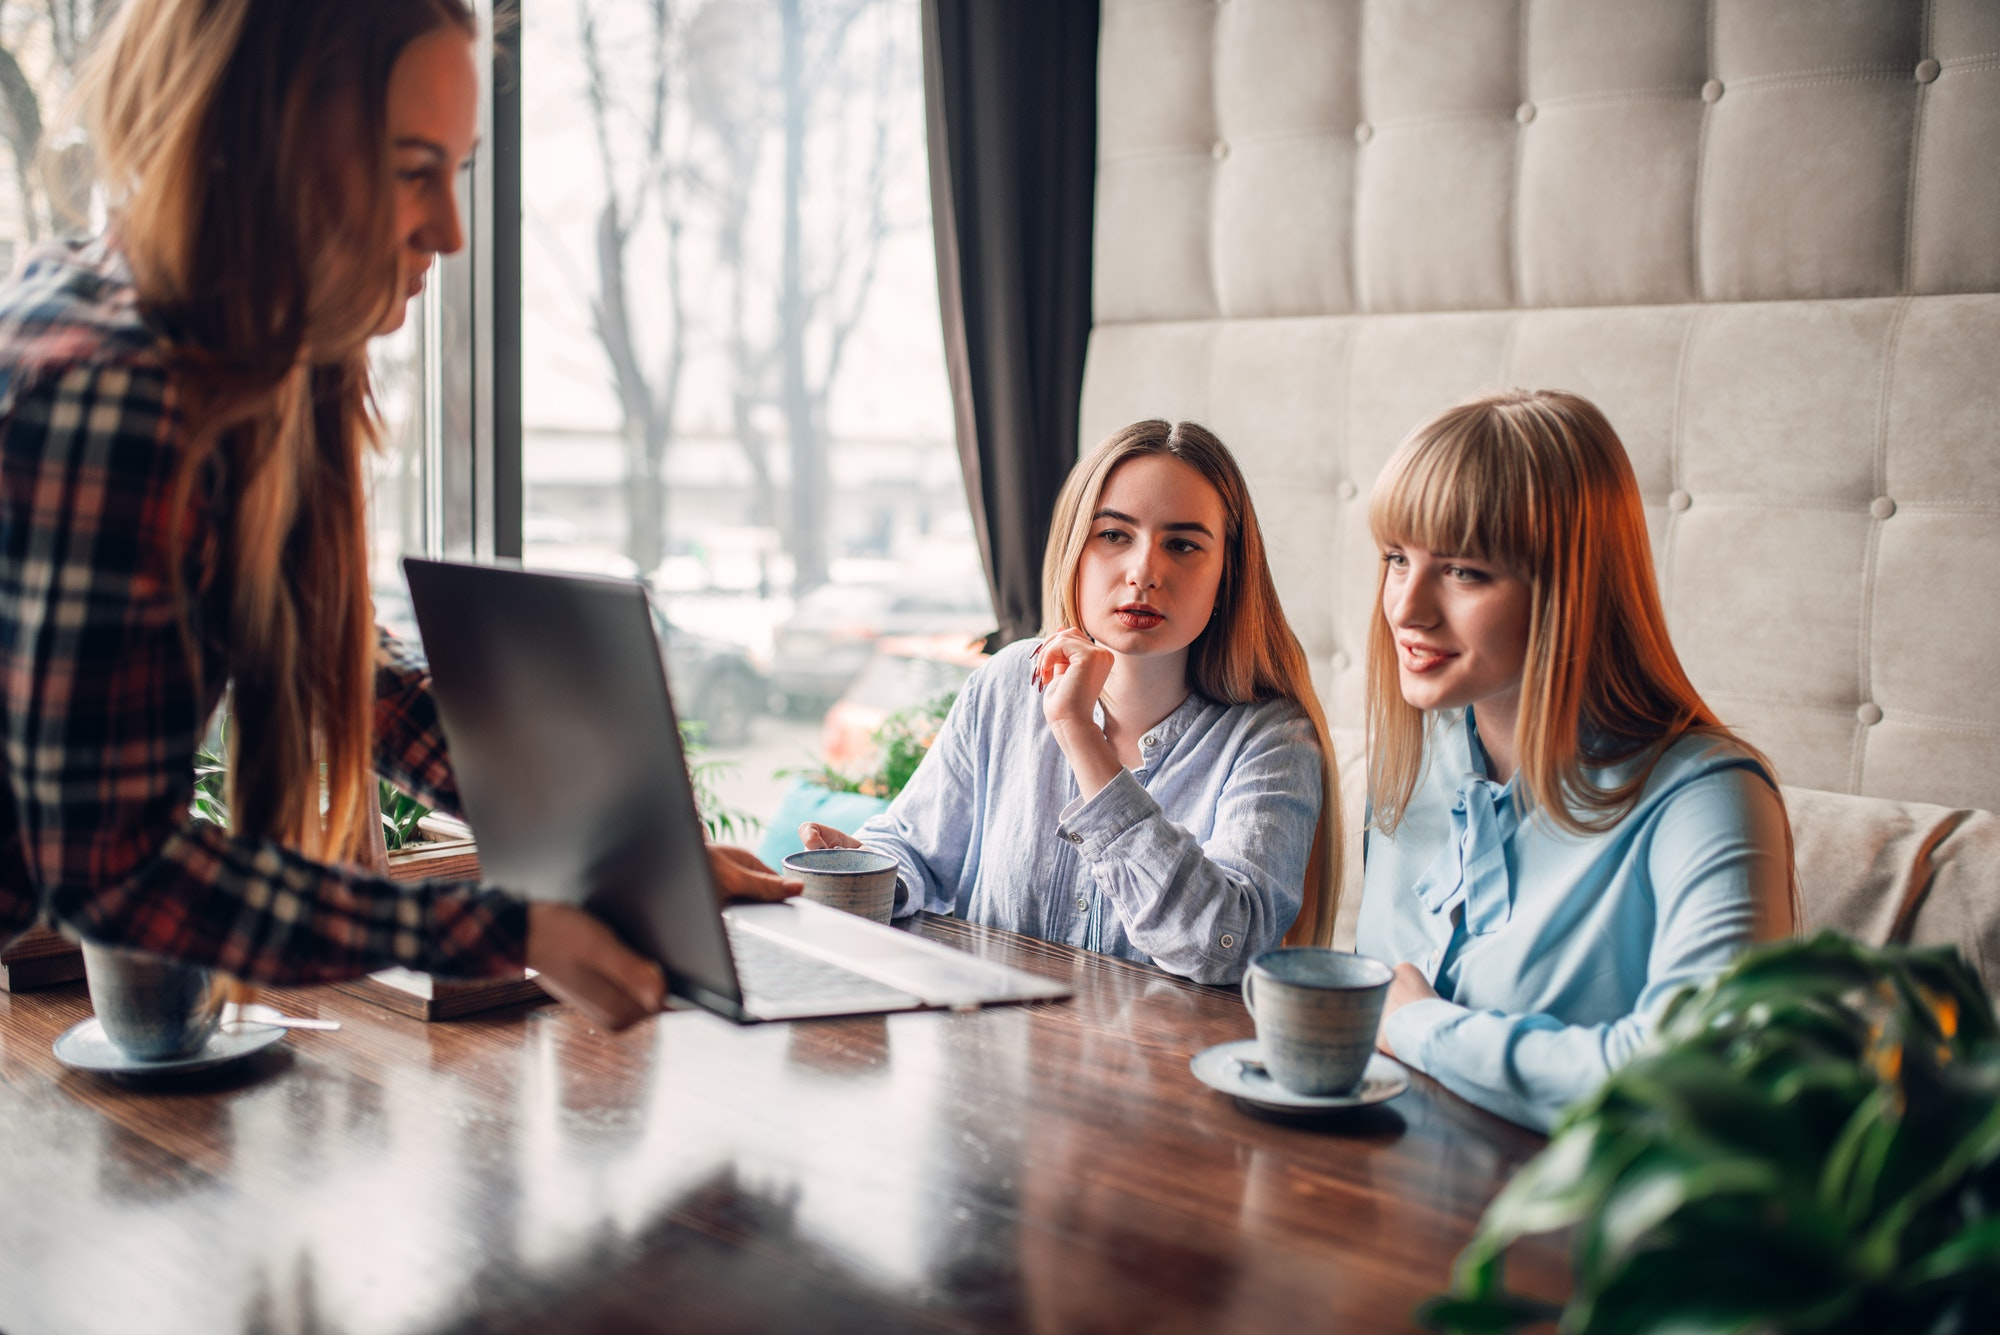 Business presentation on laptop in cafe, marketing